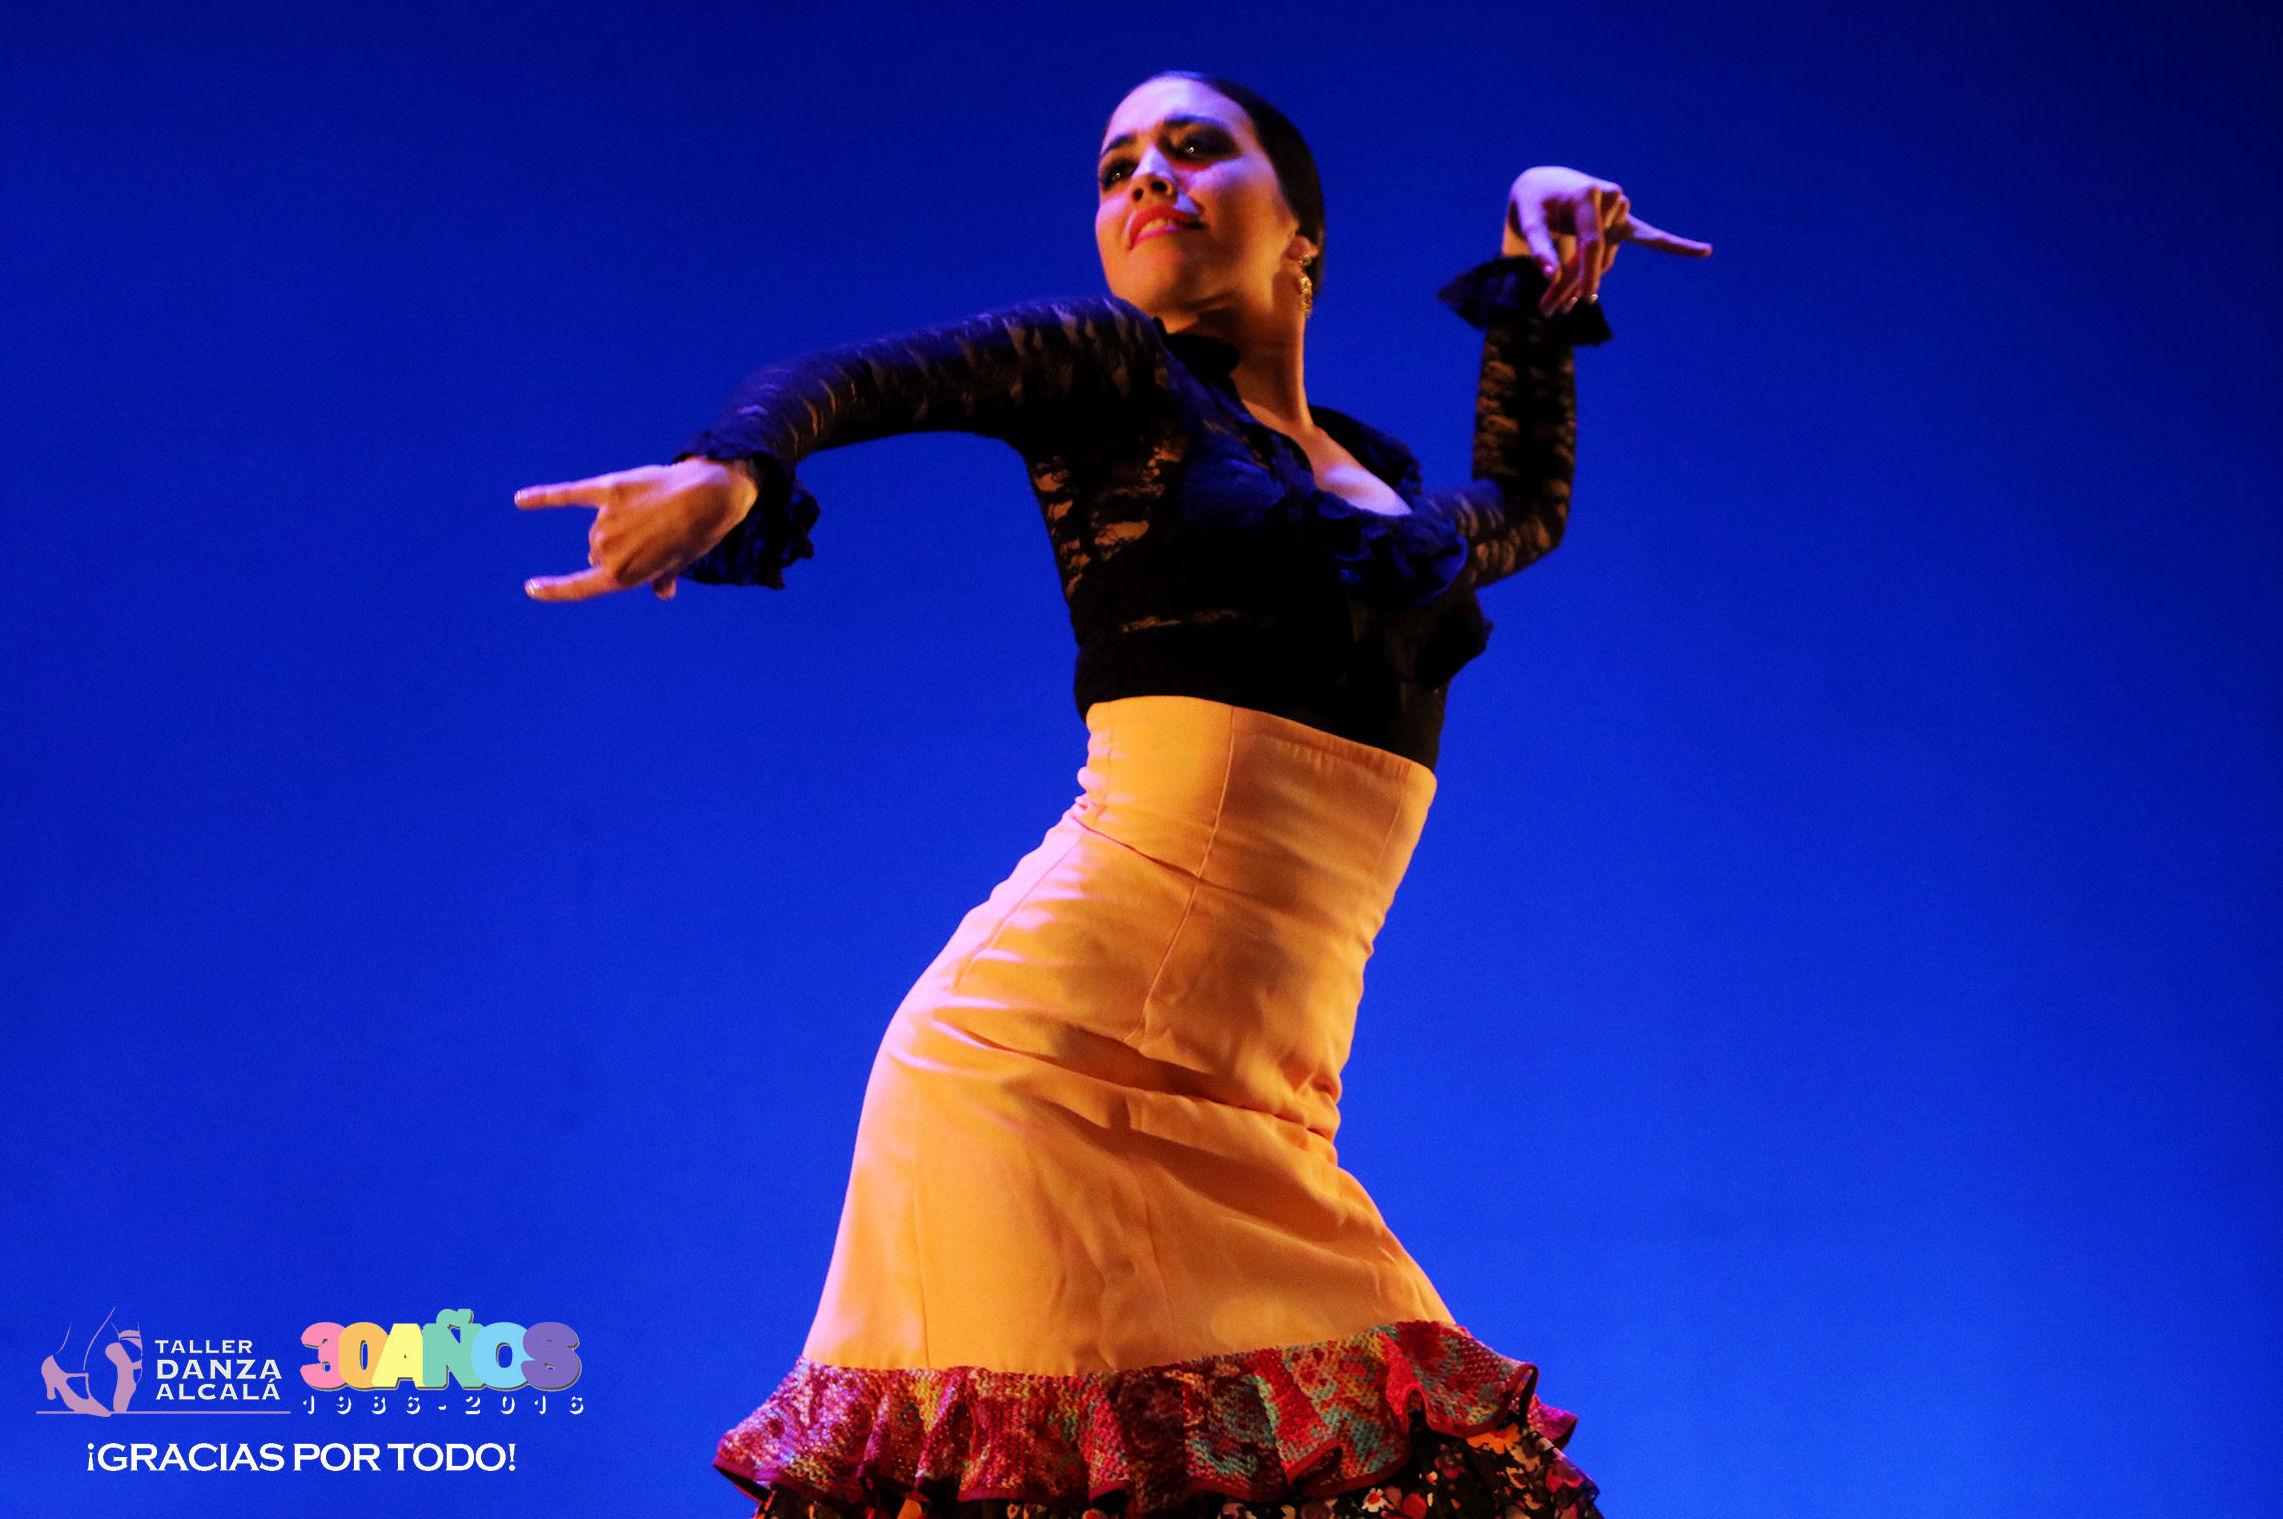 Bailes flamencos en Alcalá de Henares